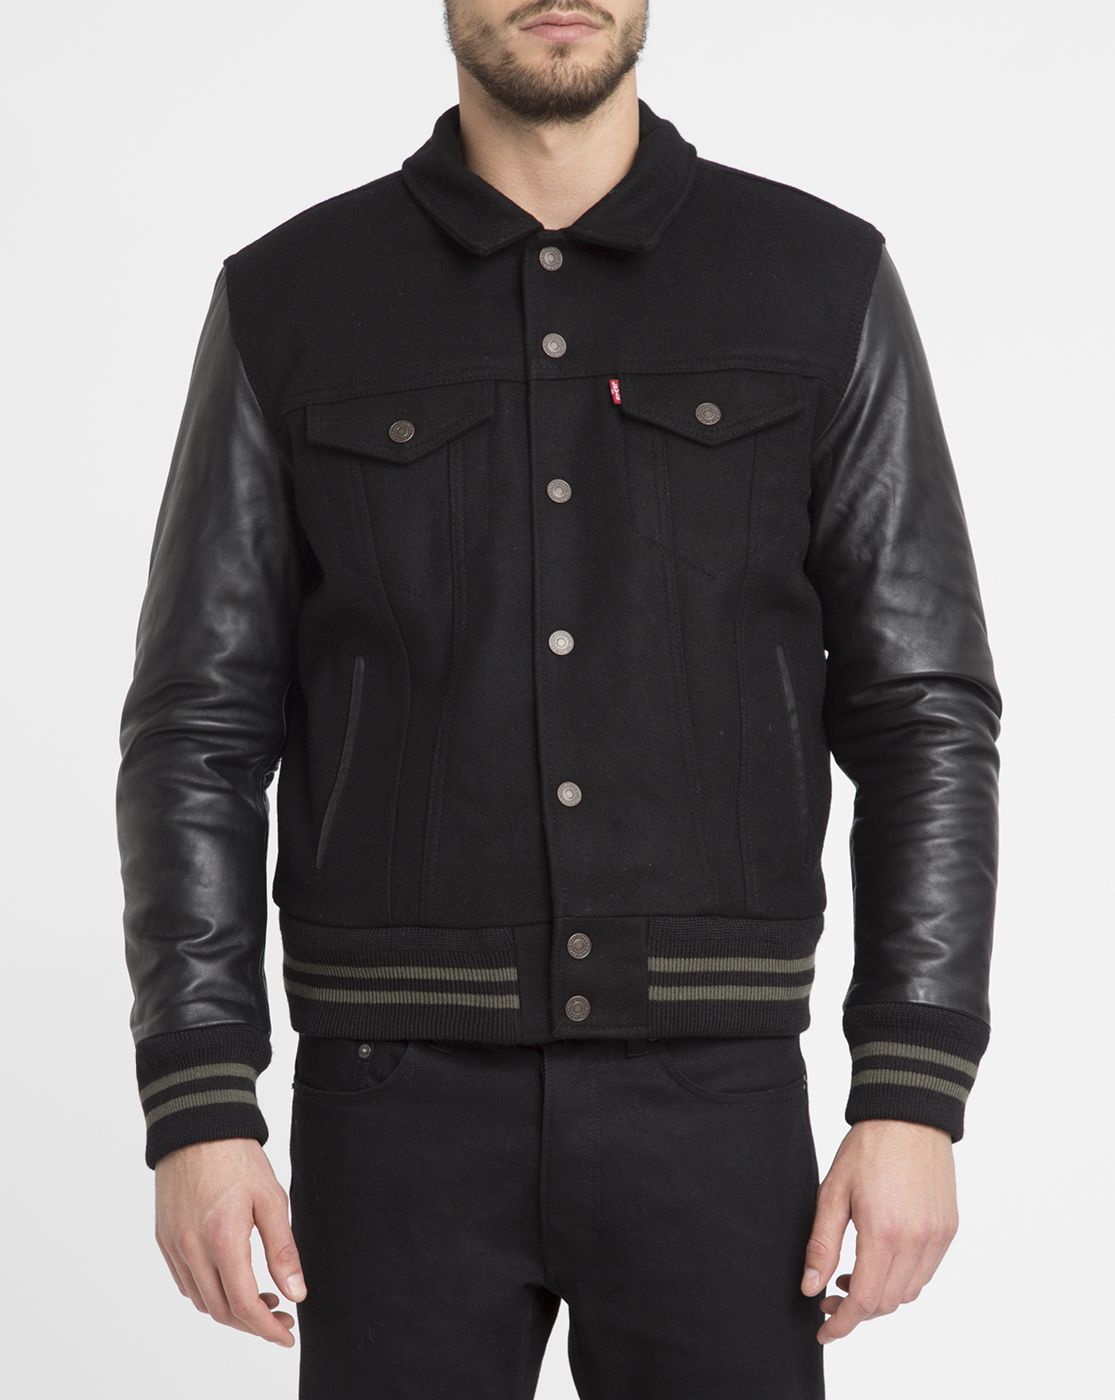 LEVI'S Black Leather and Wool Trucker Jacket for Men Enjoy